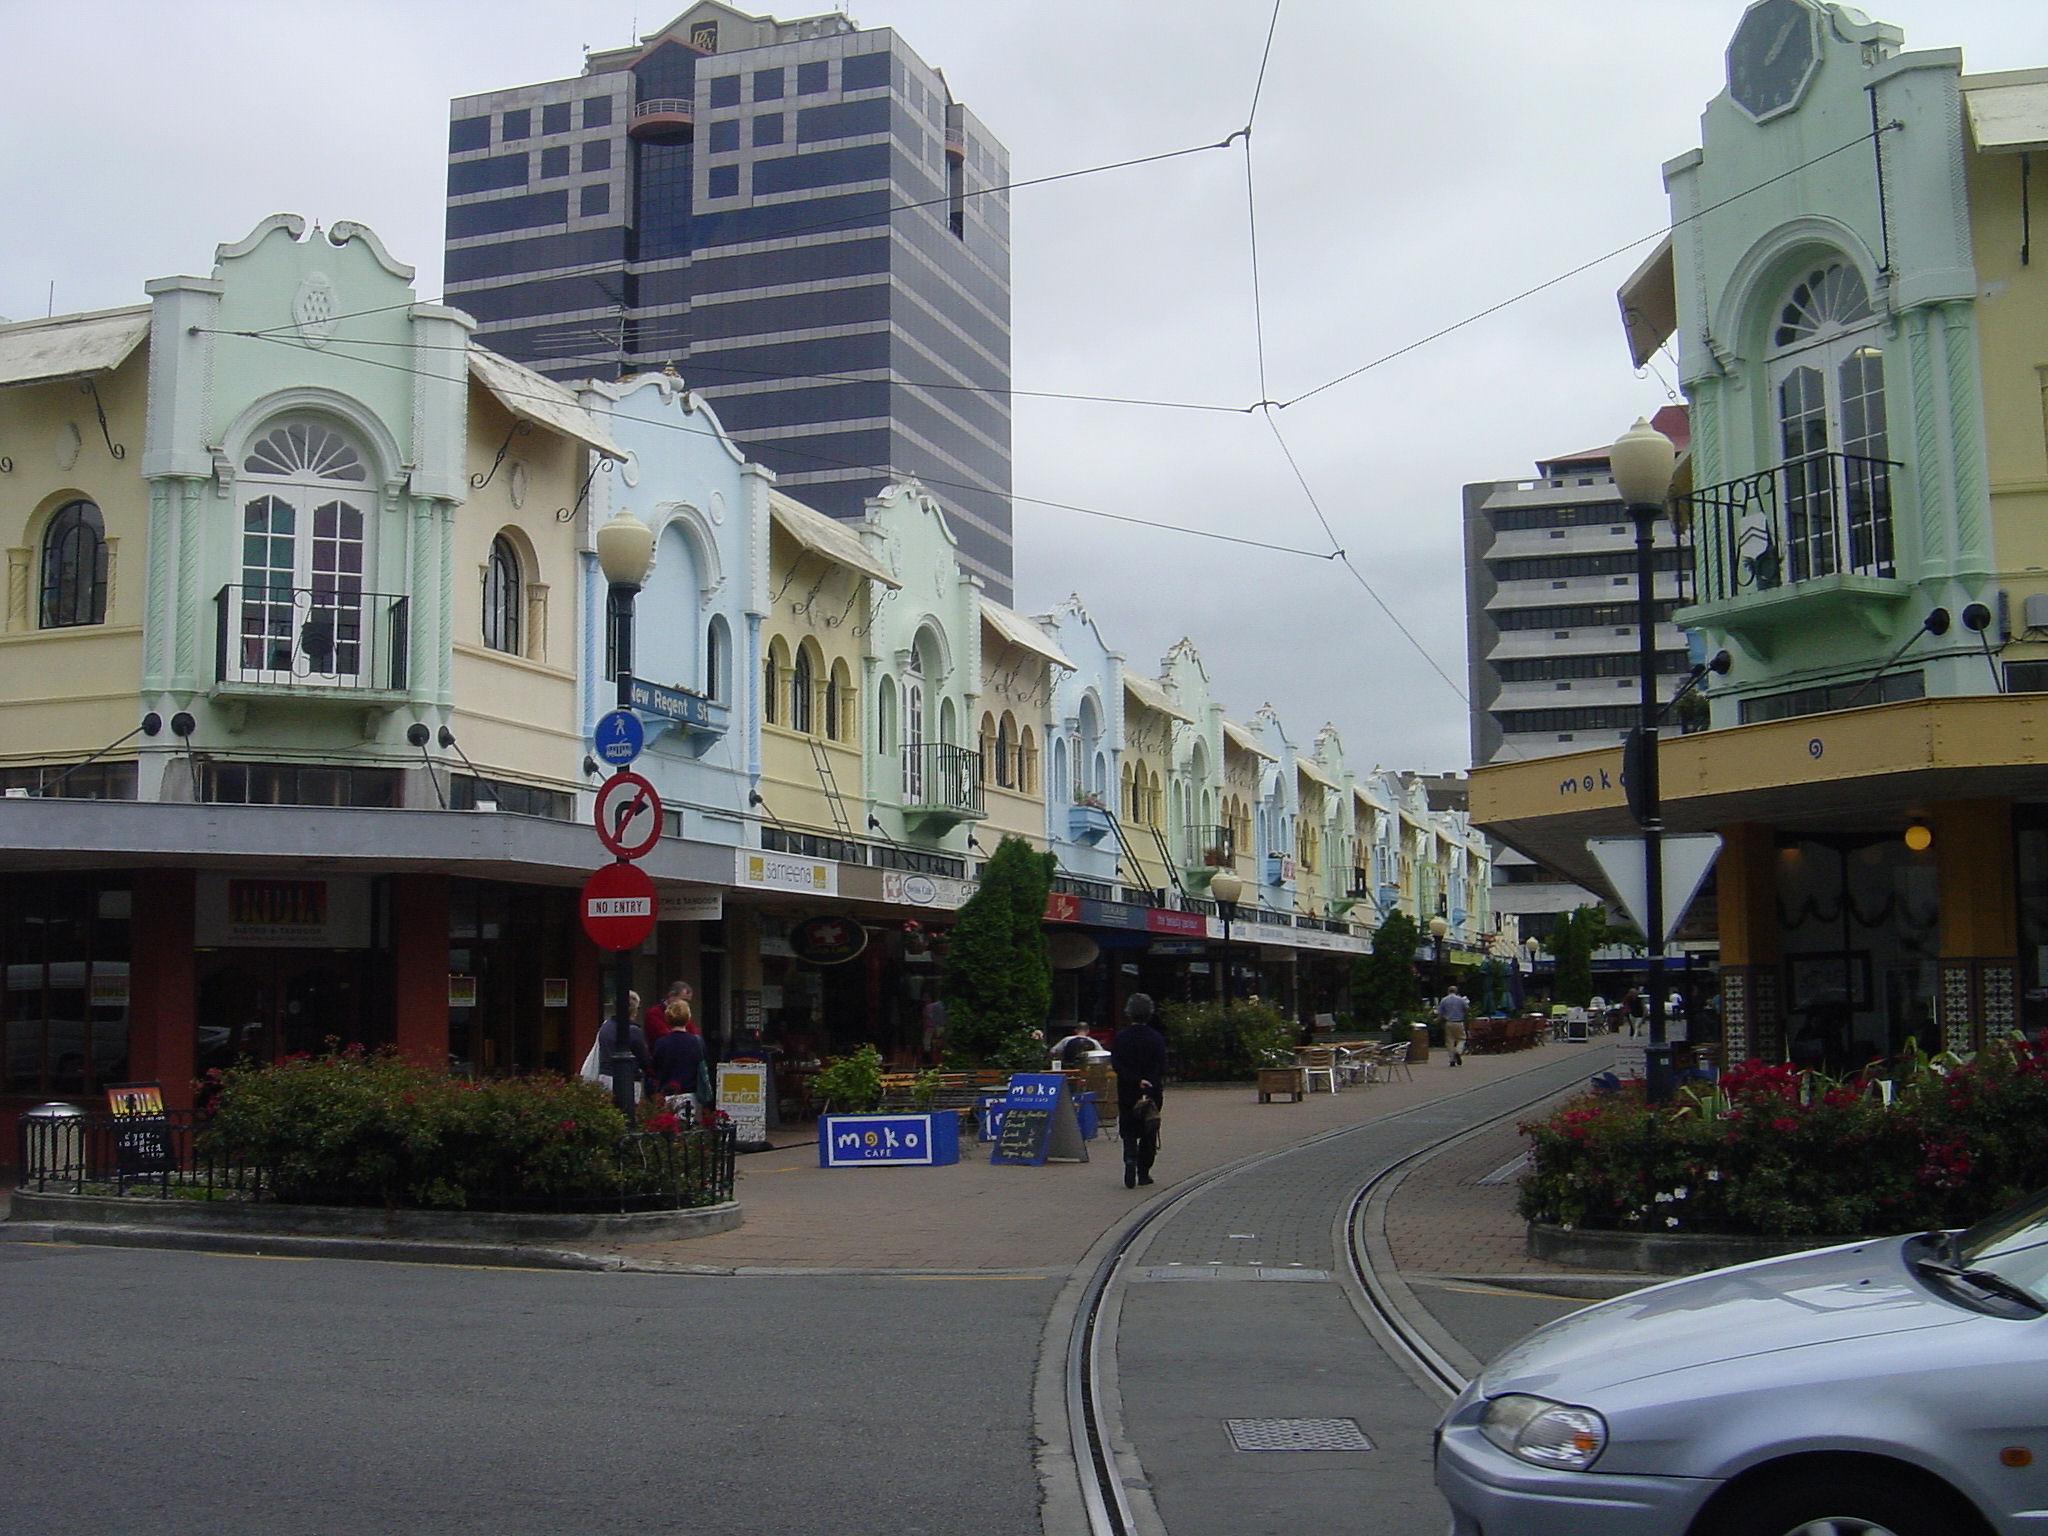 New Zealand Street Food